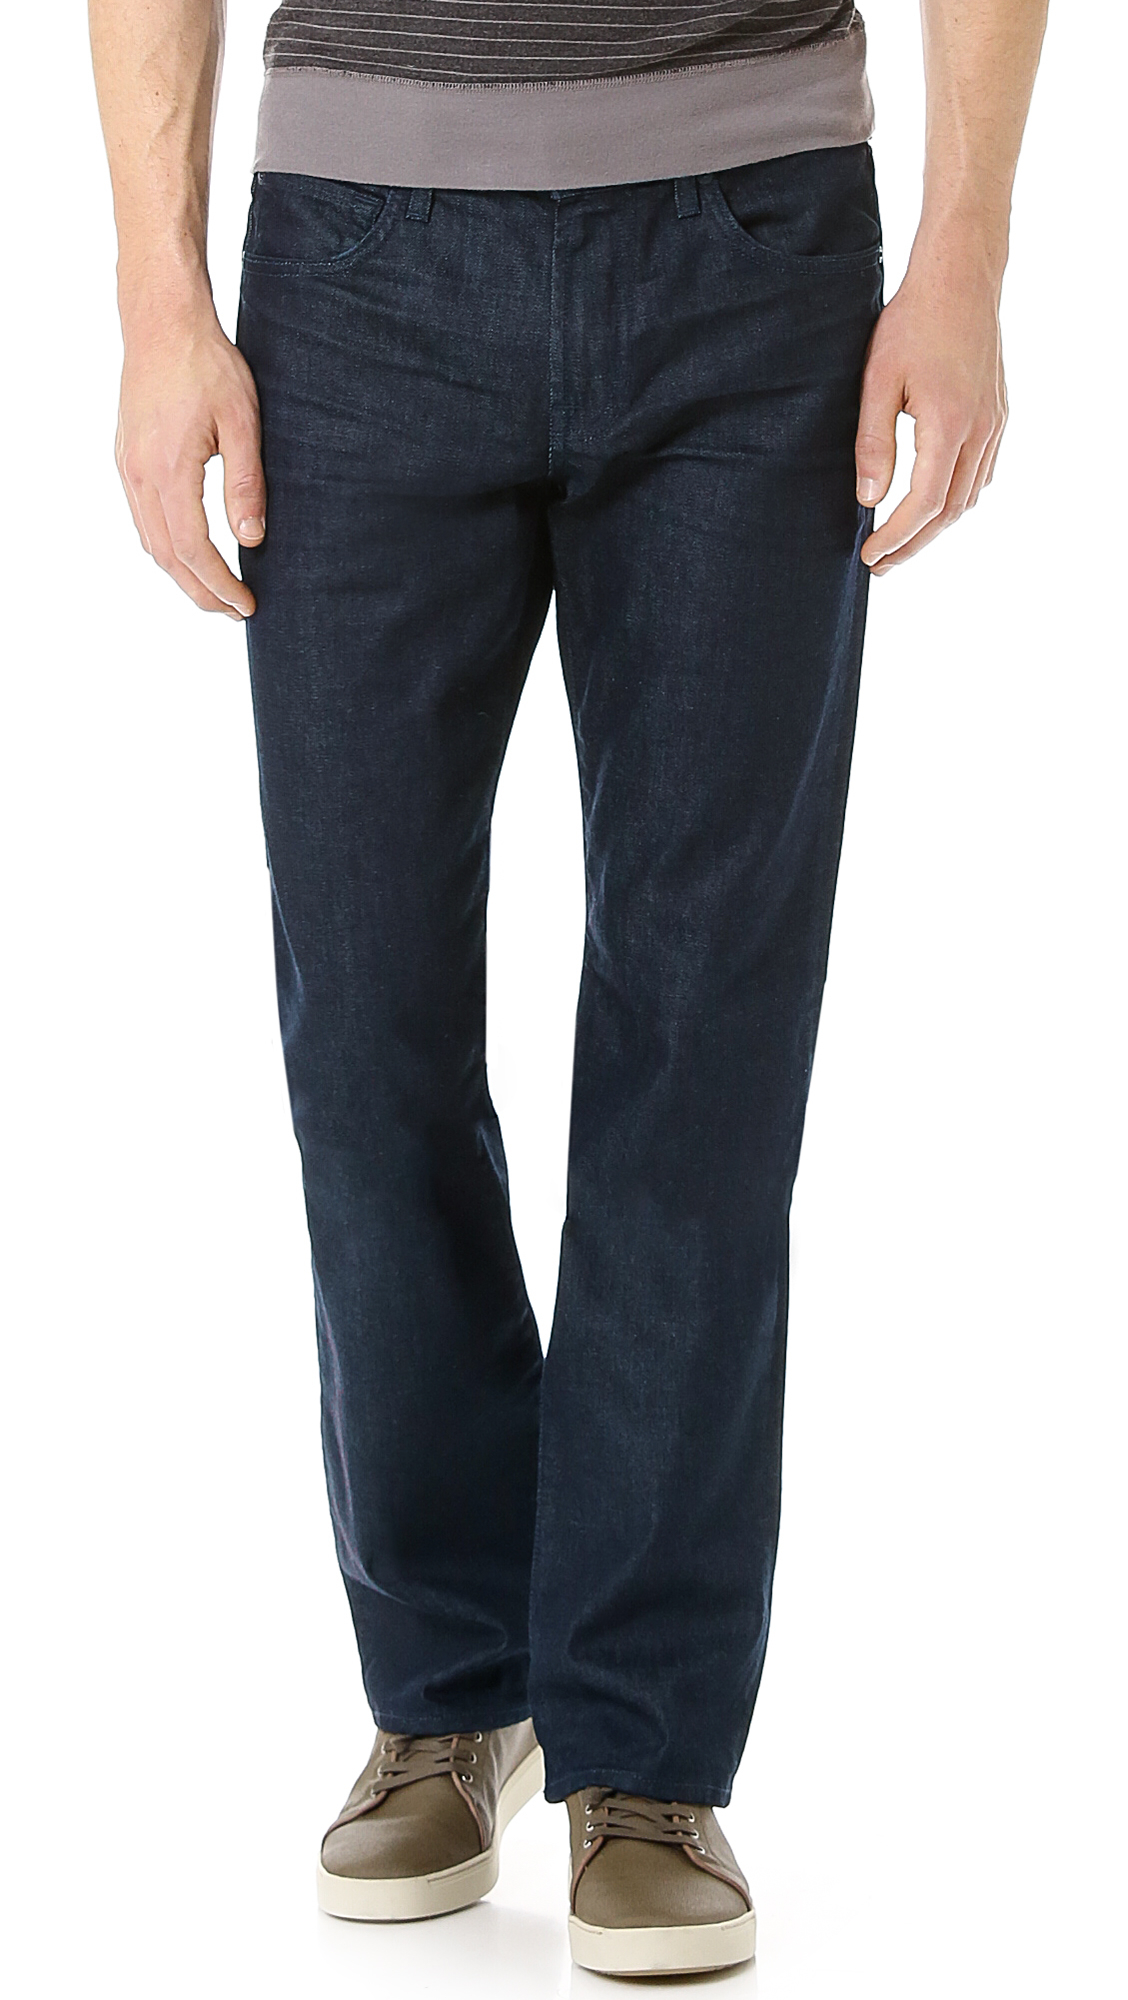 lyst 7 for all mankind carsen easy fit jeans in blue for men. Black Bedroom Furniture Sets. Home Design Ideas